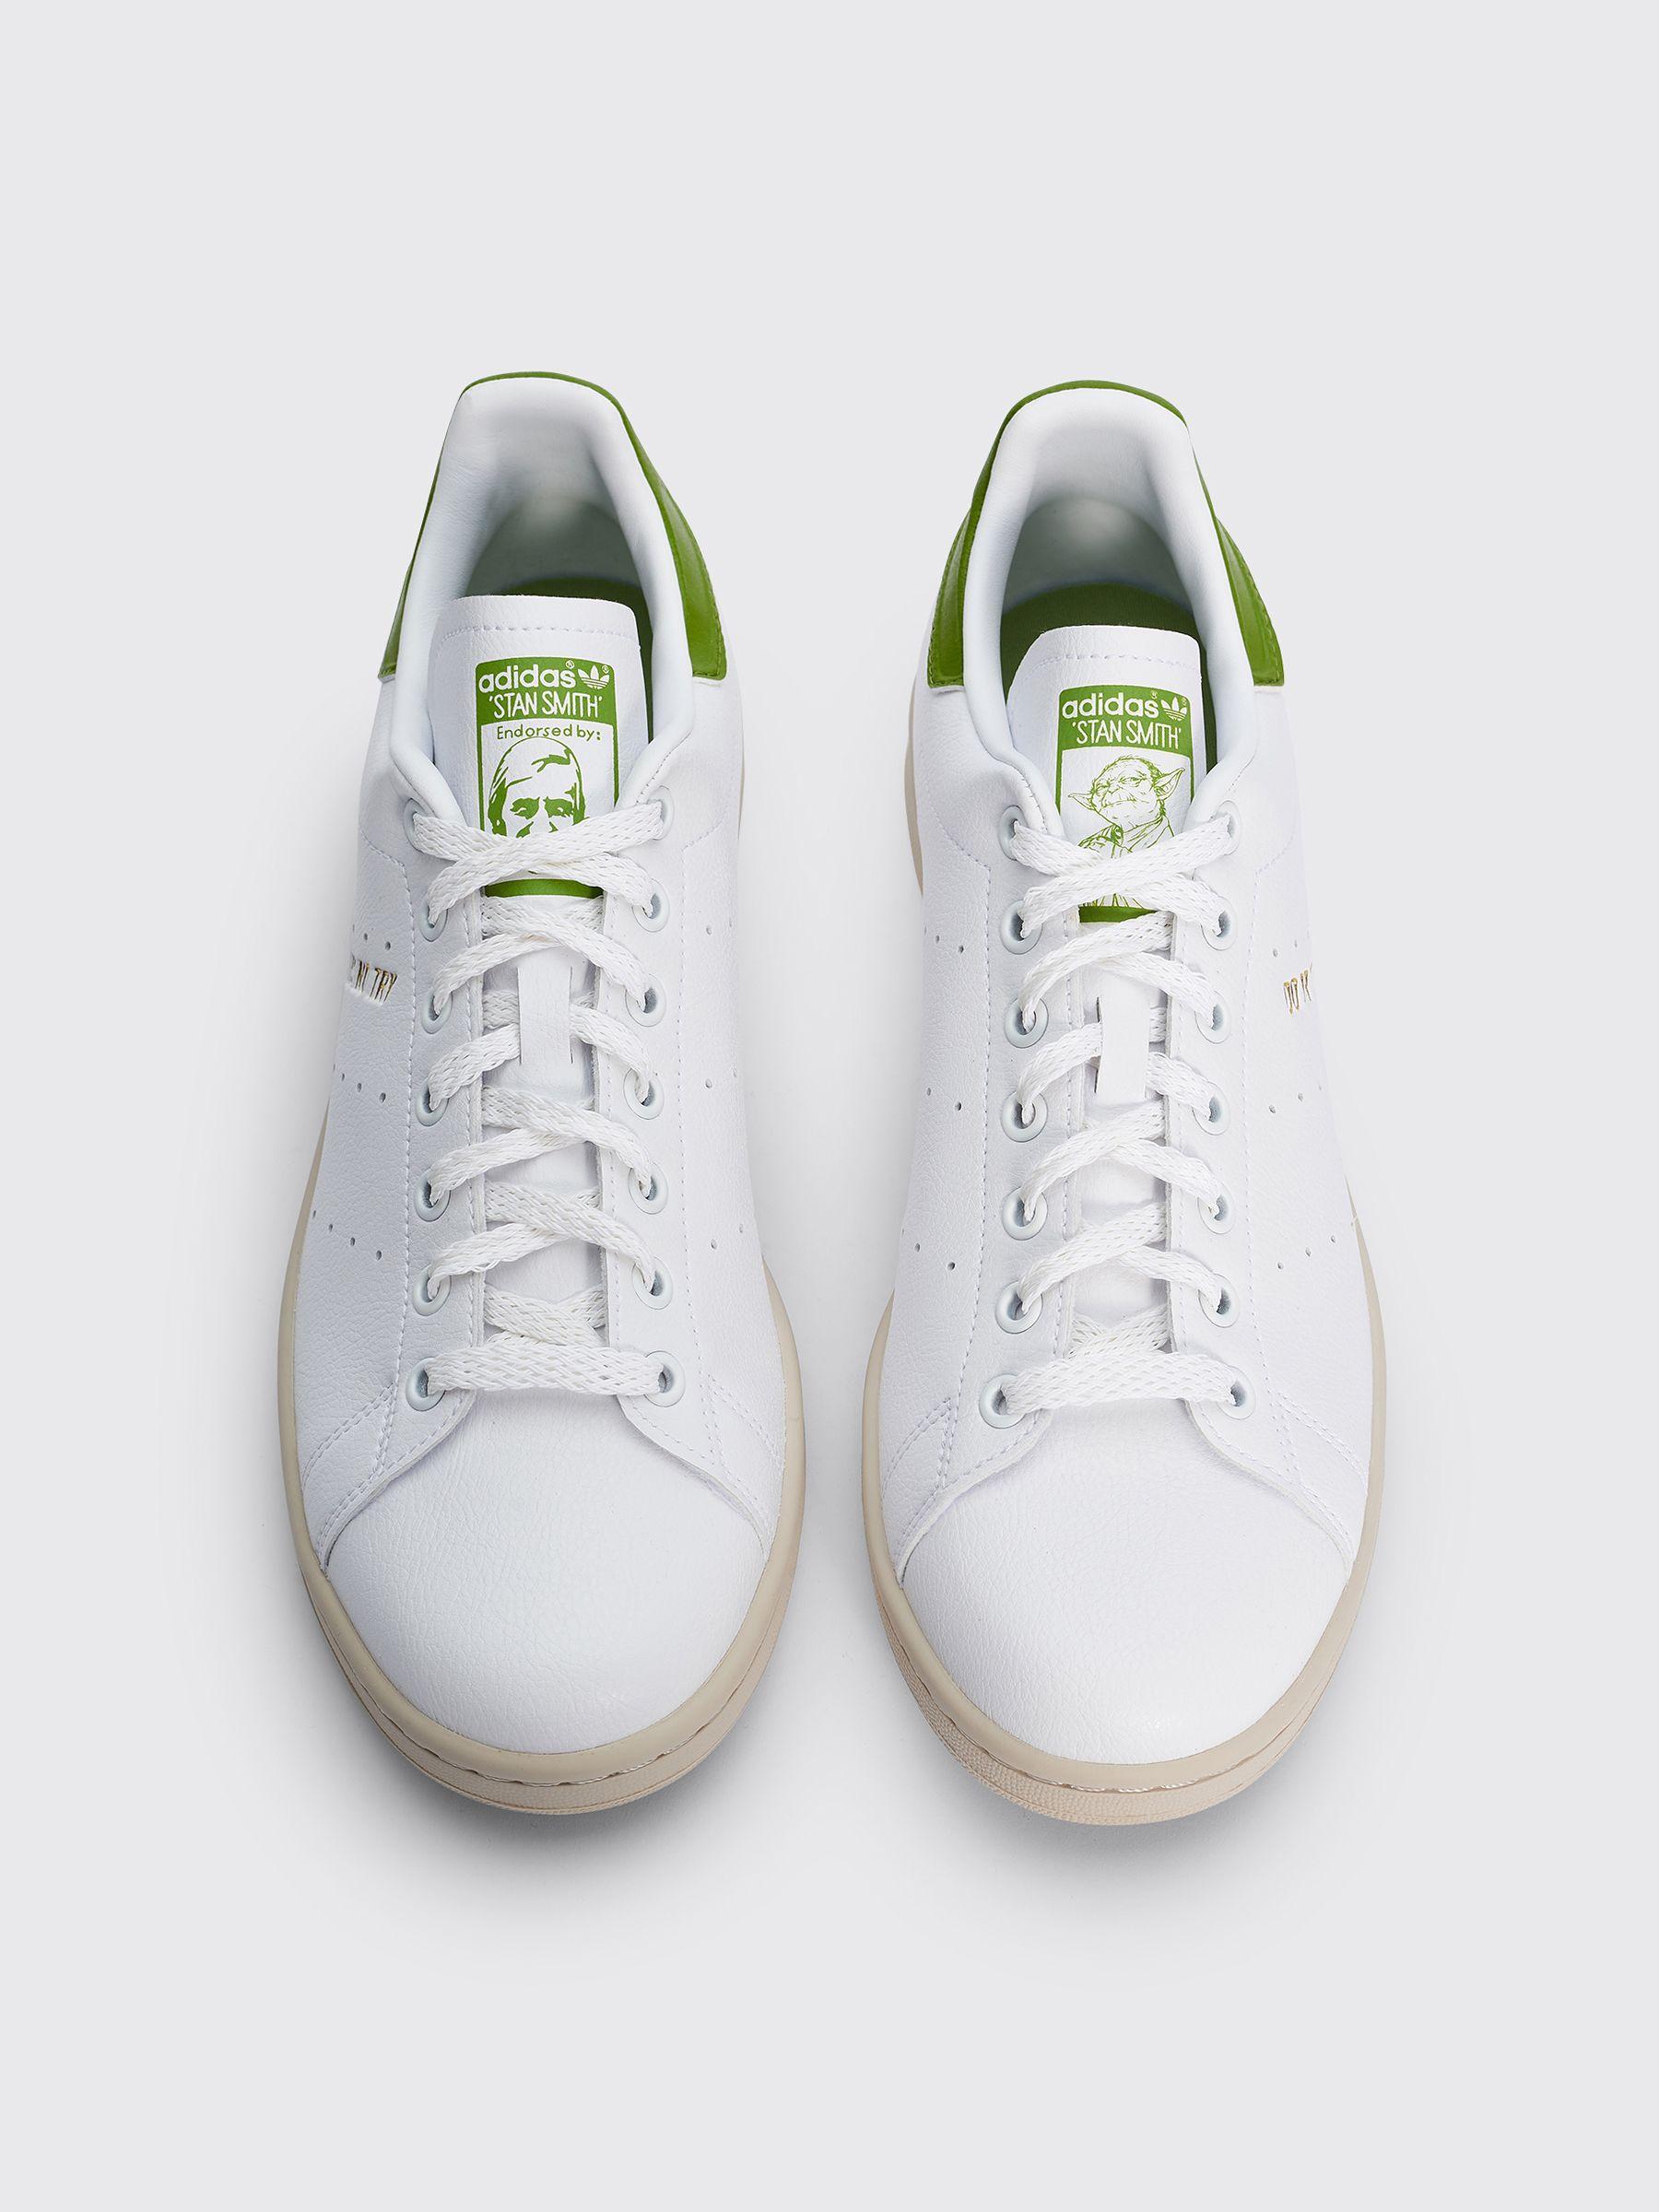 Adidas Originals Stan Smith CF White/Green | S75187 - Naked